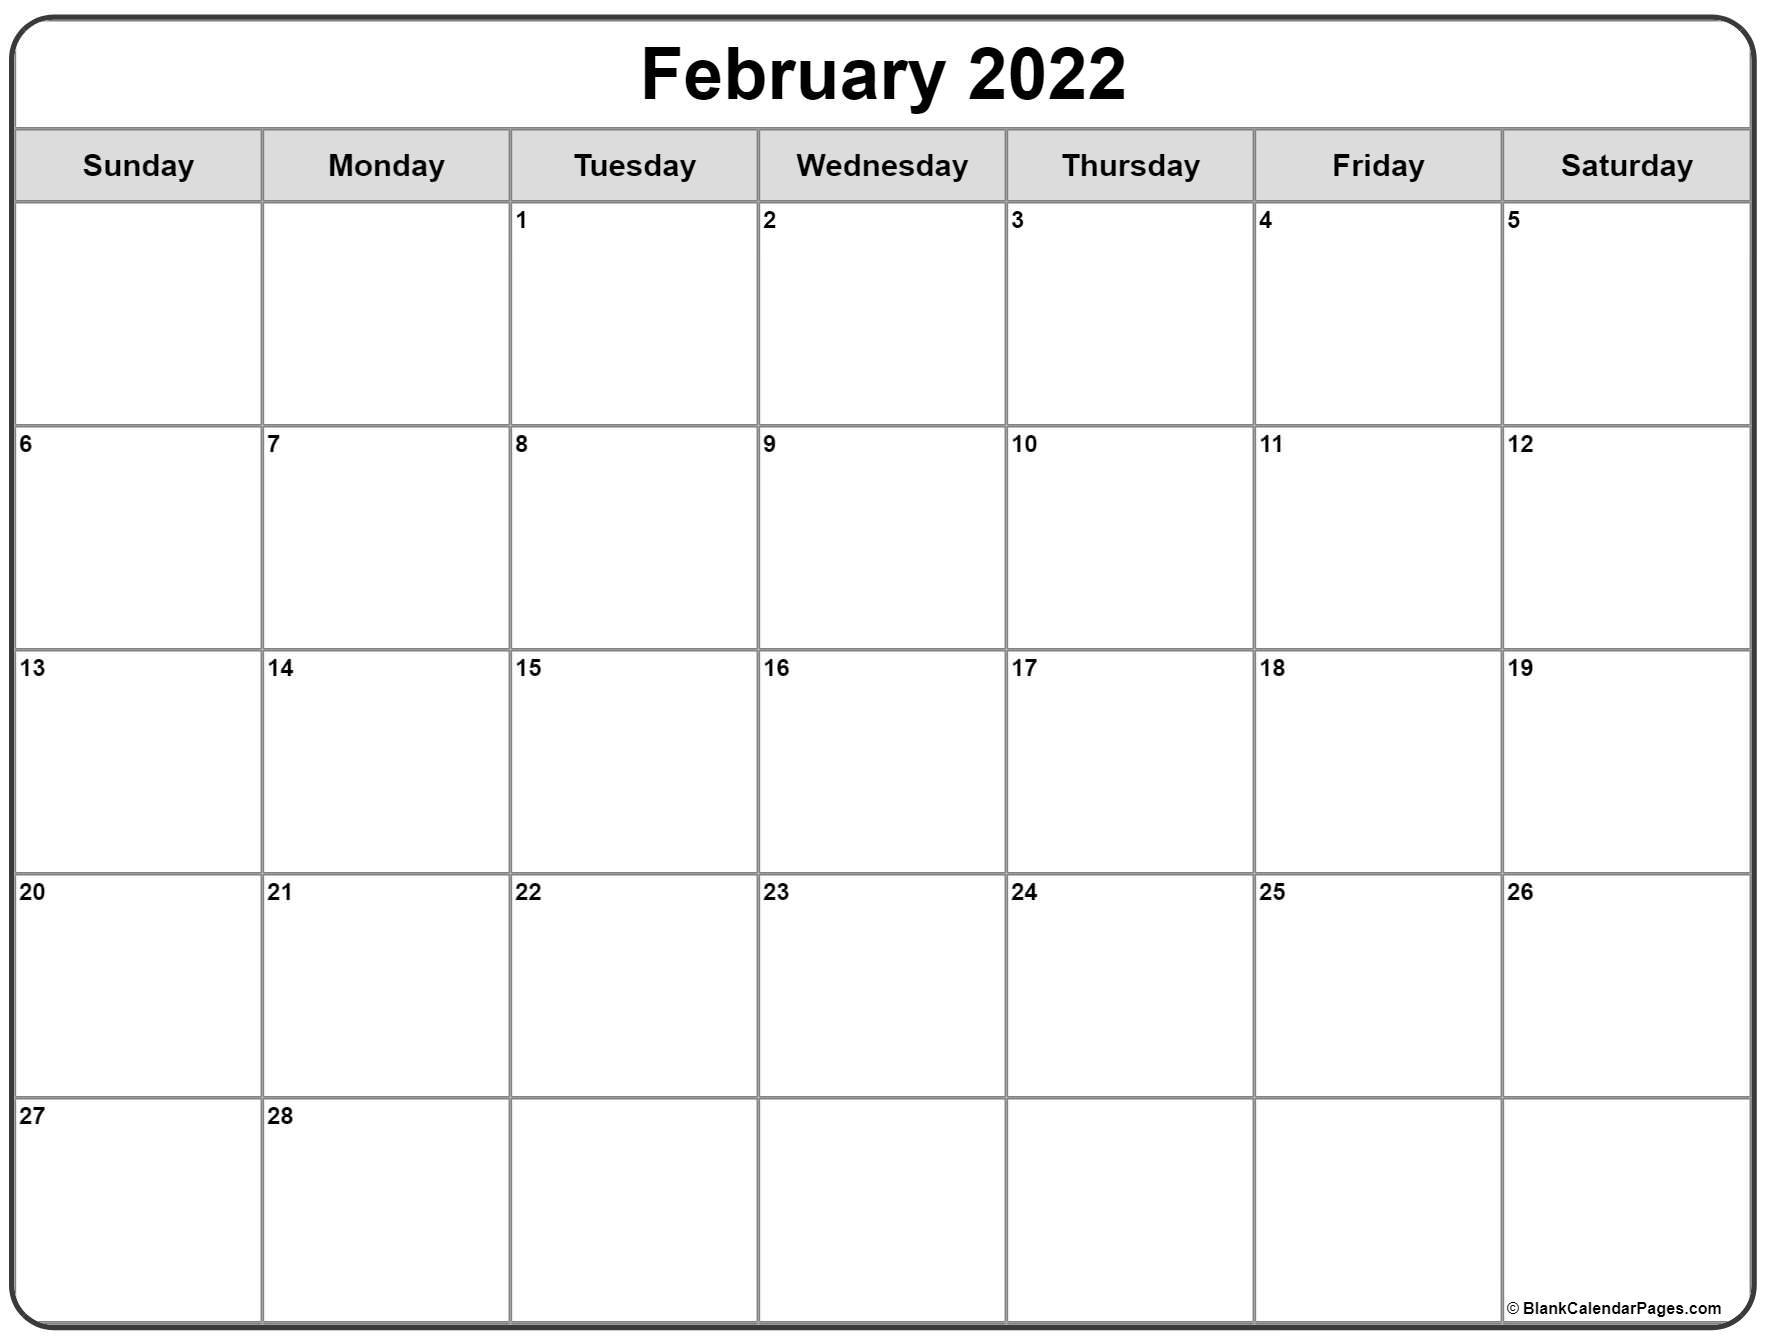 February 2022 Calendar   Free Printable Calendar Templates With February 2022 Month Calendar Page